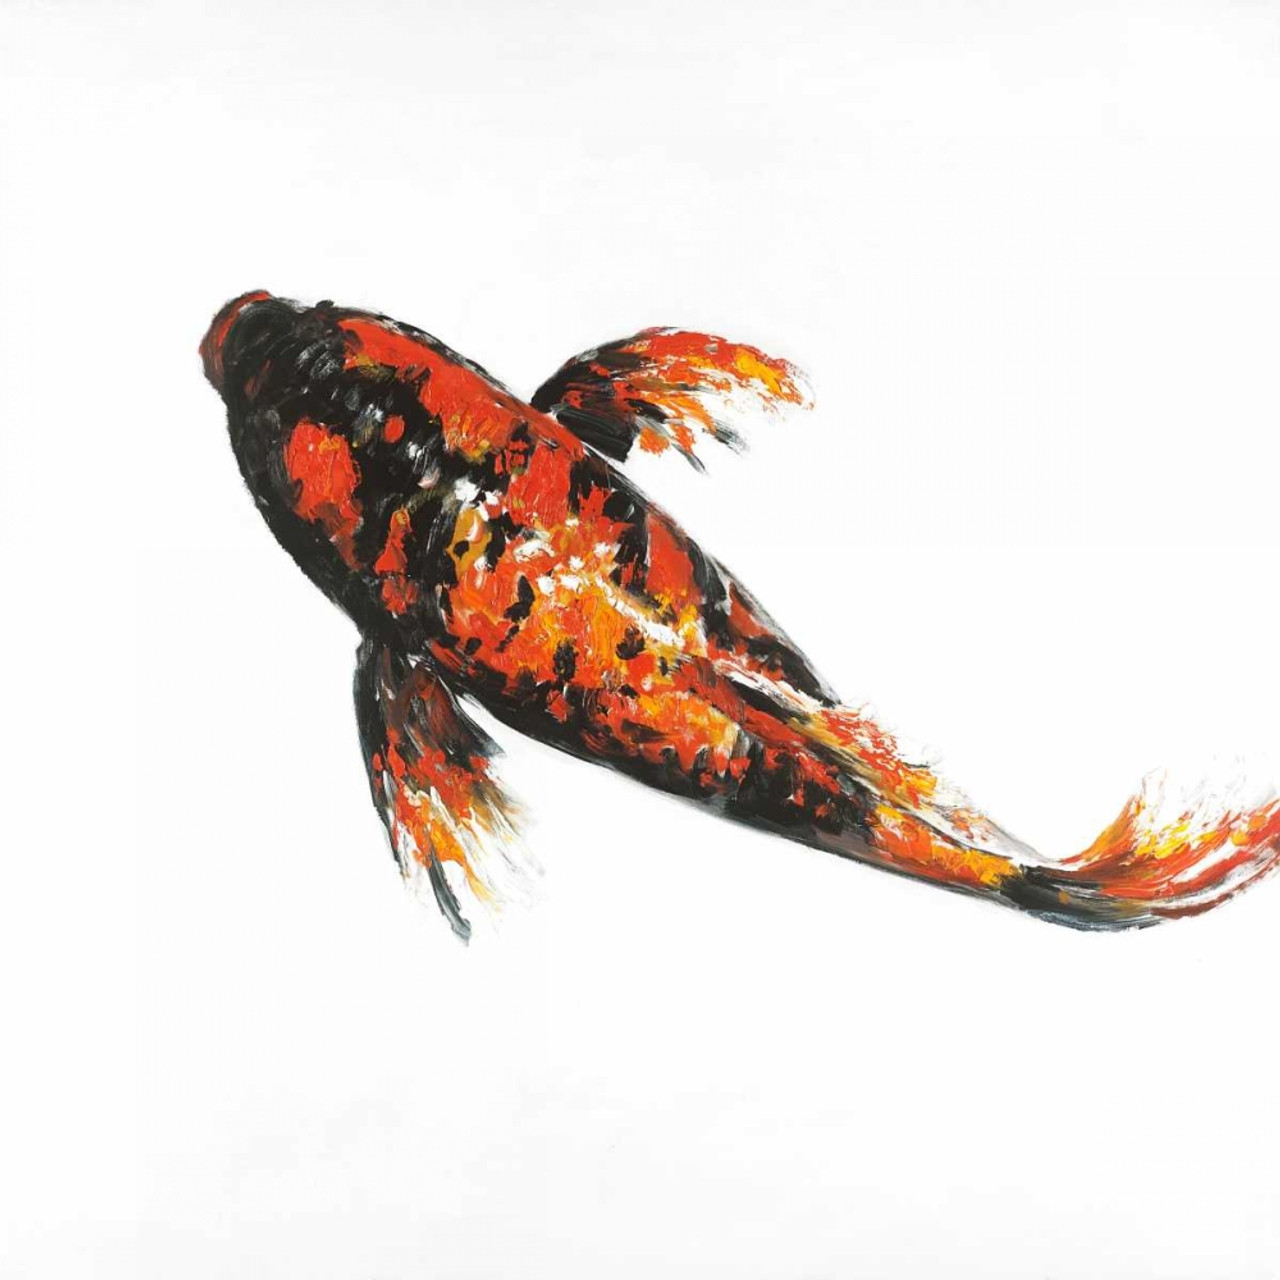 Red Butterfly Koi Fish Poster Print By Atelier B Art Studio Item Varpdxbegani304 Posterazzi